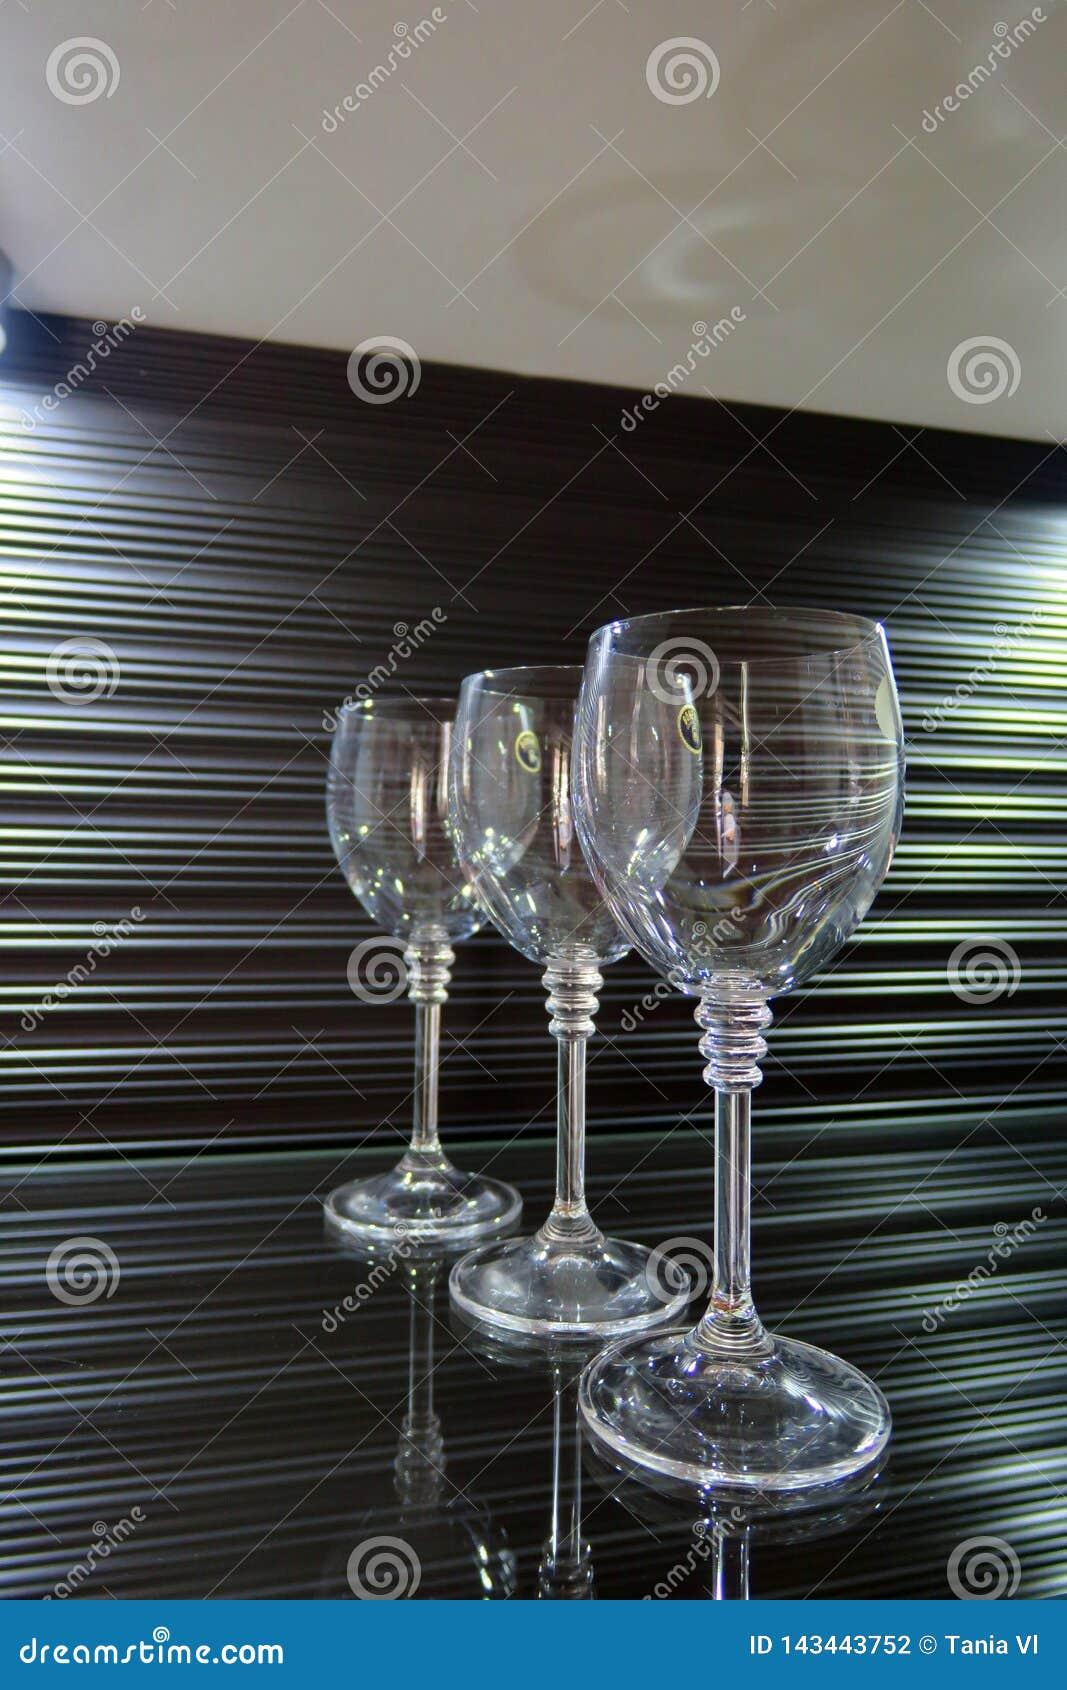 Drie hoge transparante glazen op een mooie bruine achtergrond